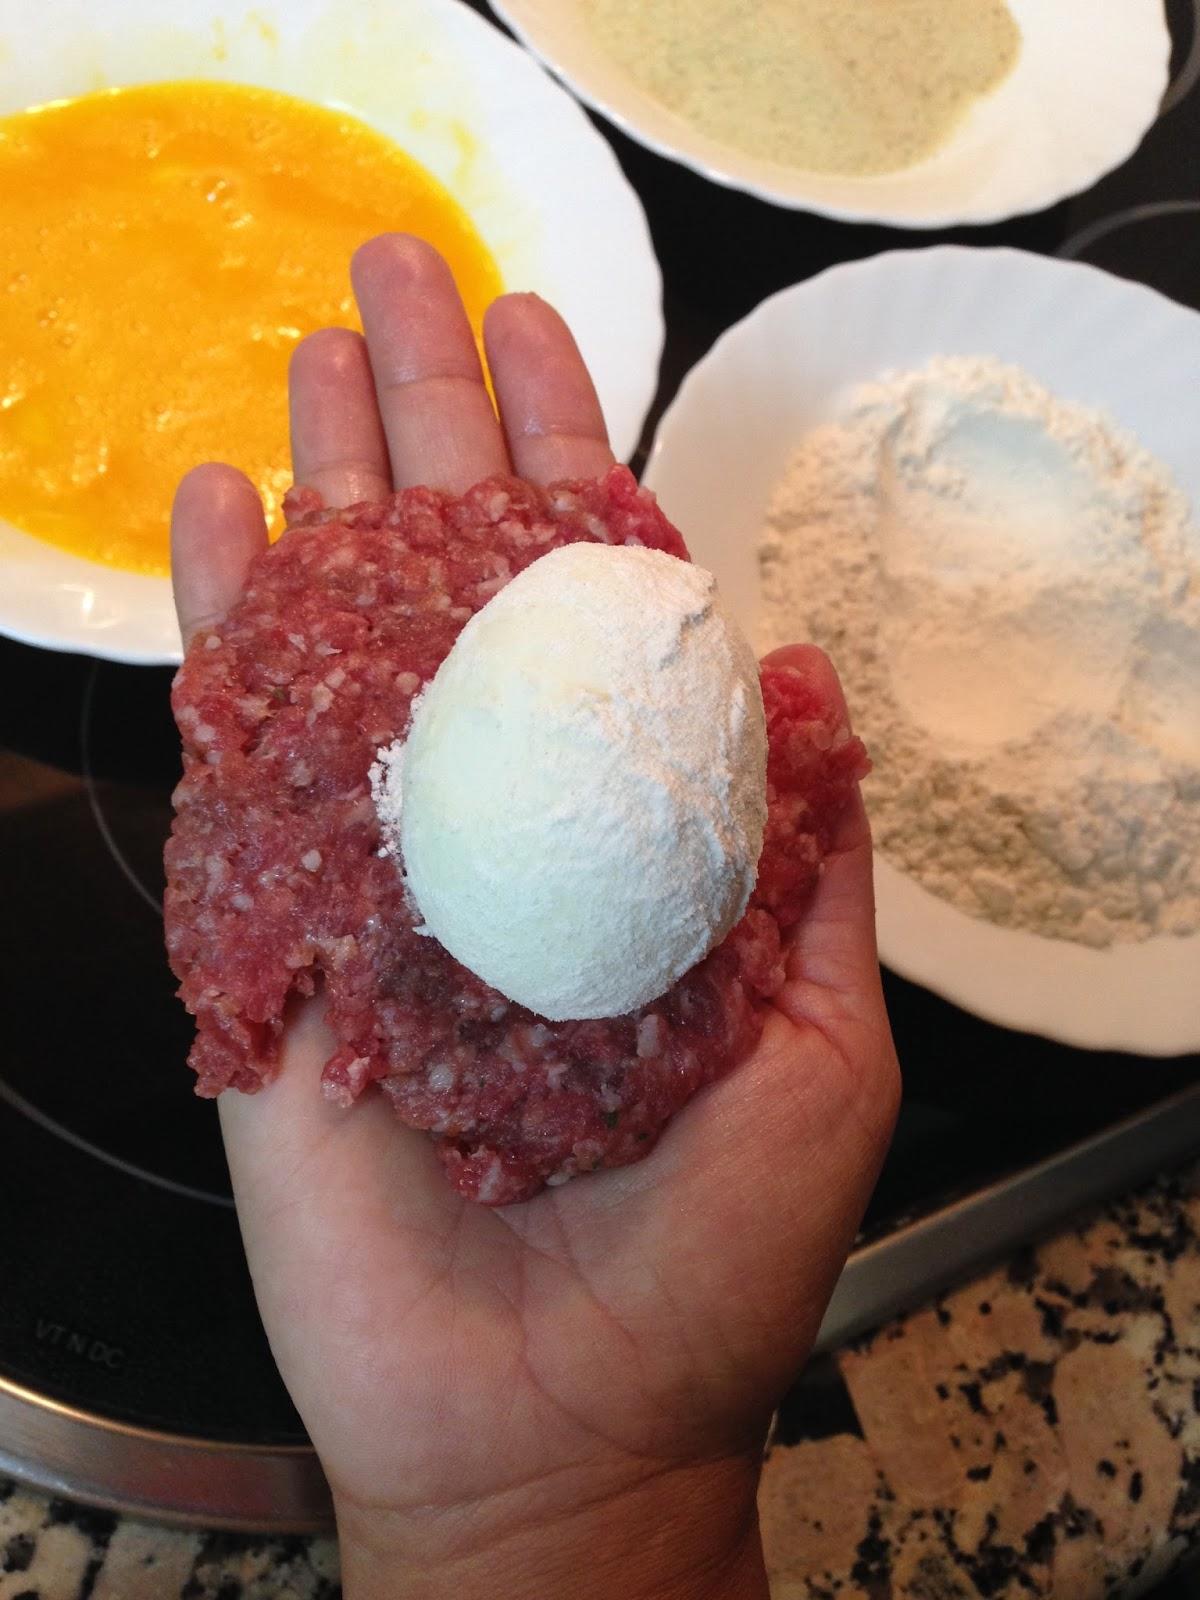 Me rompen los huevos - 2 part 1